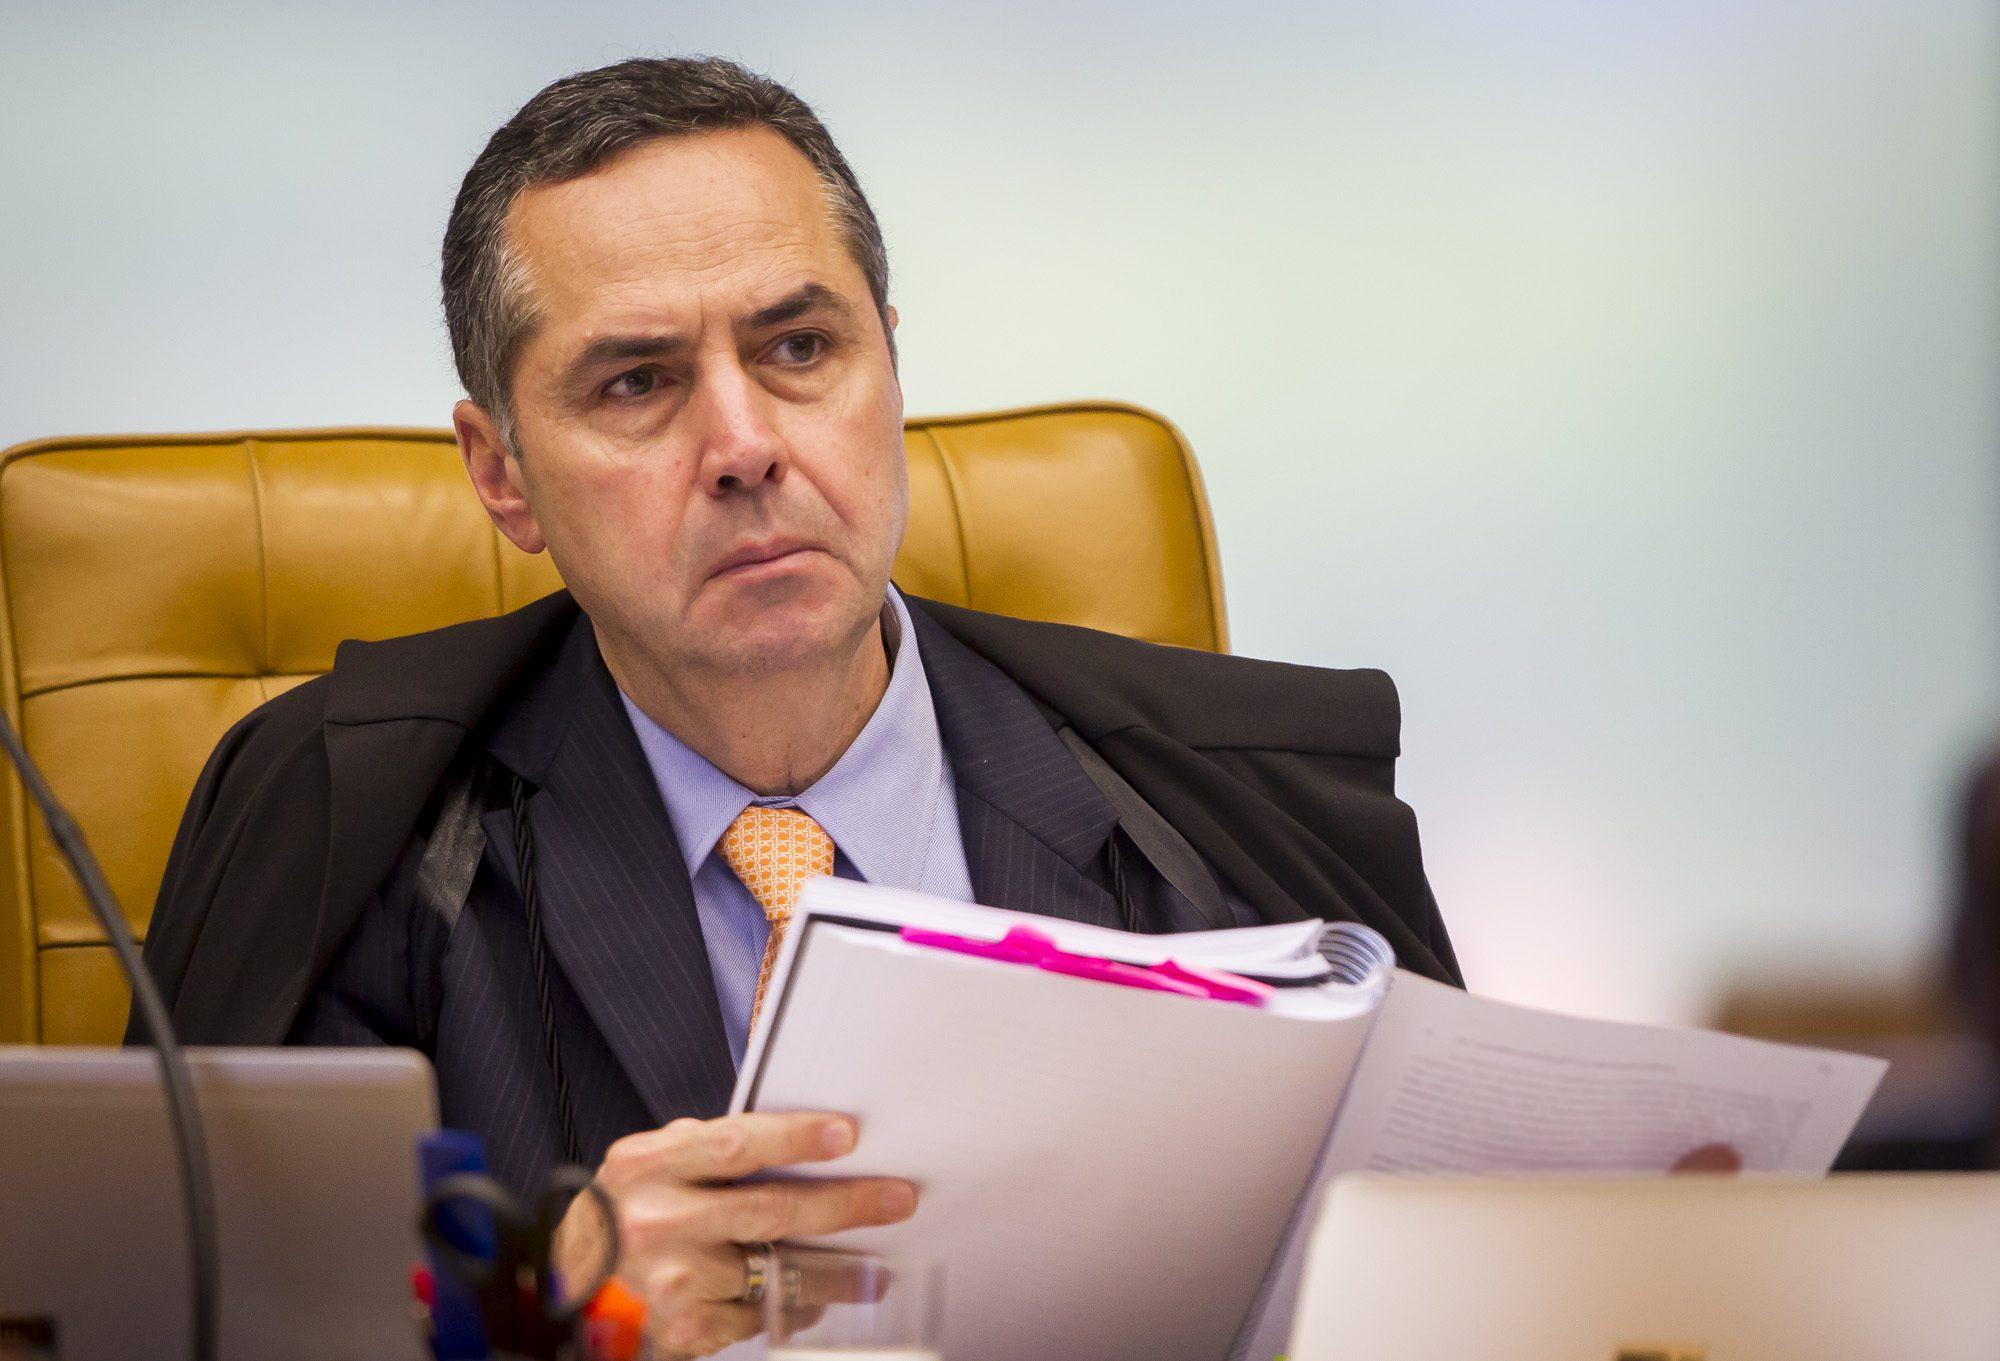 Barroso altera pontos do indulto de Natal editado por Temer